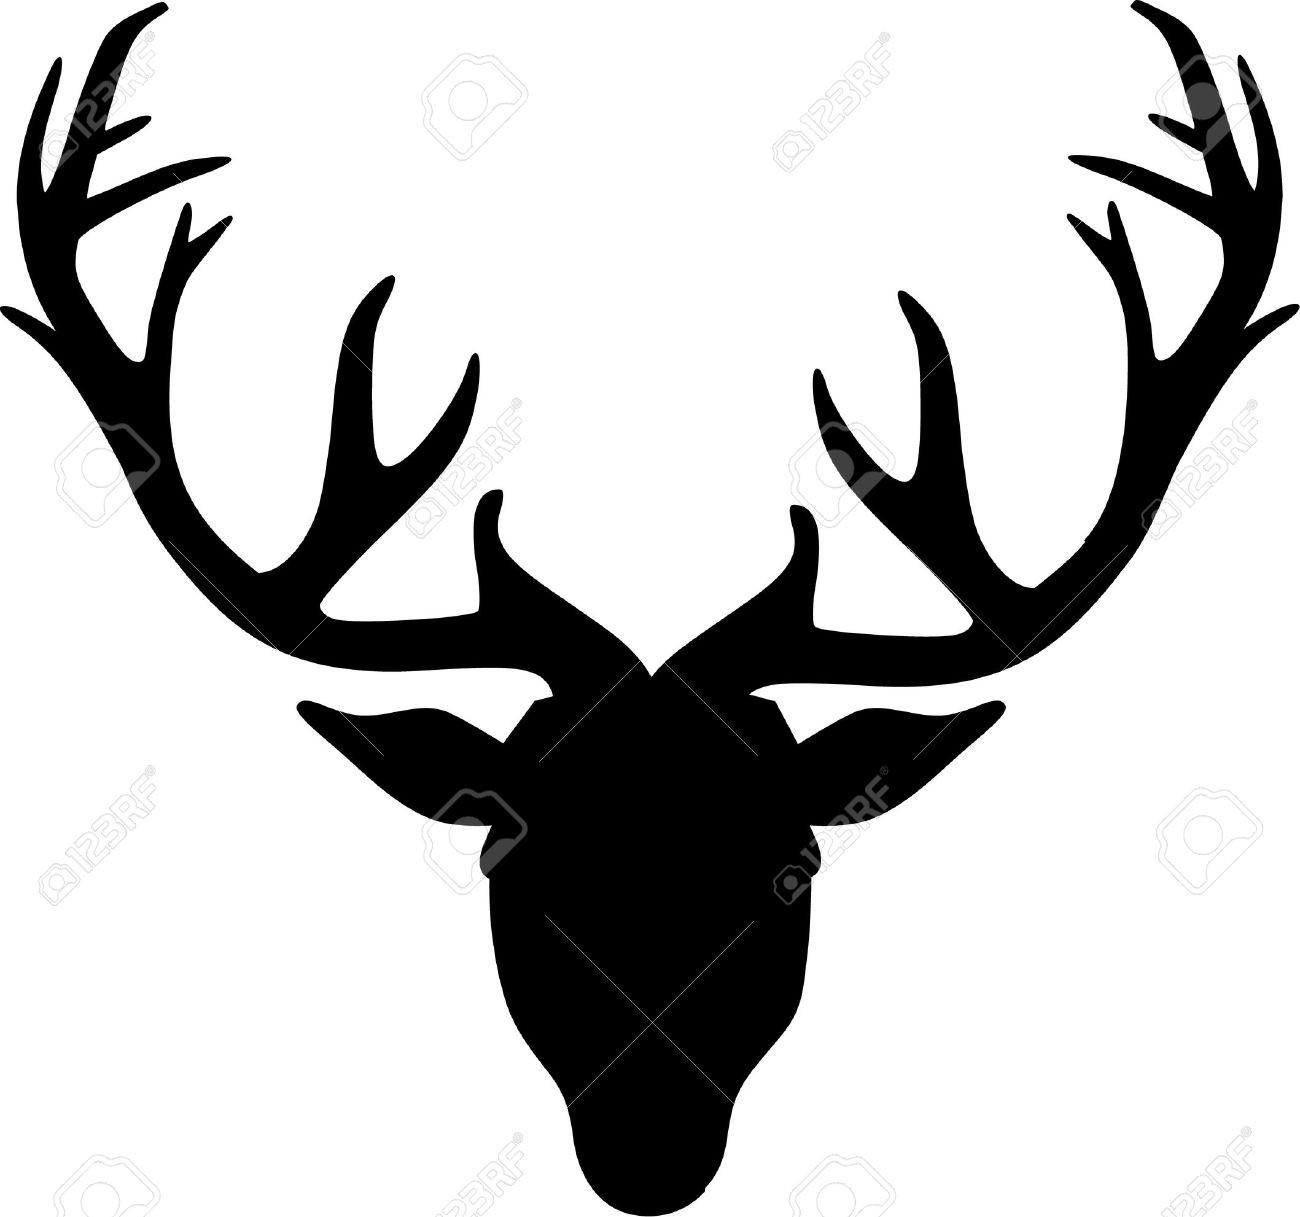 1300x1217 Deer S Head With Antler Black Silhouette Royalty Free Vector